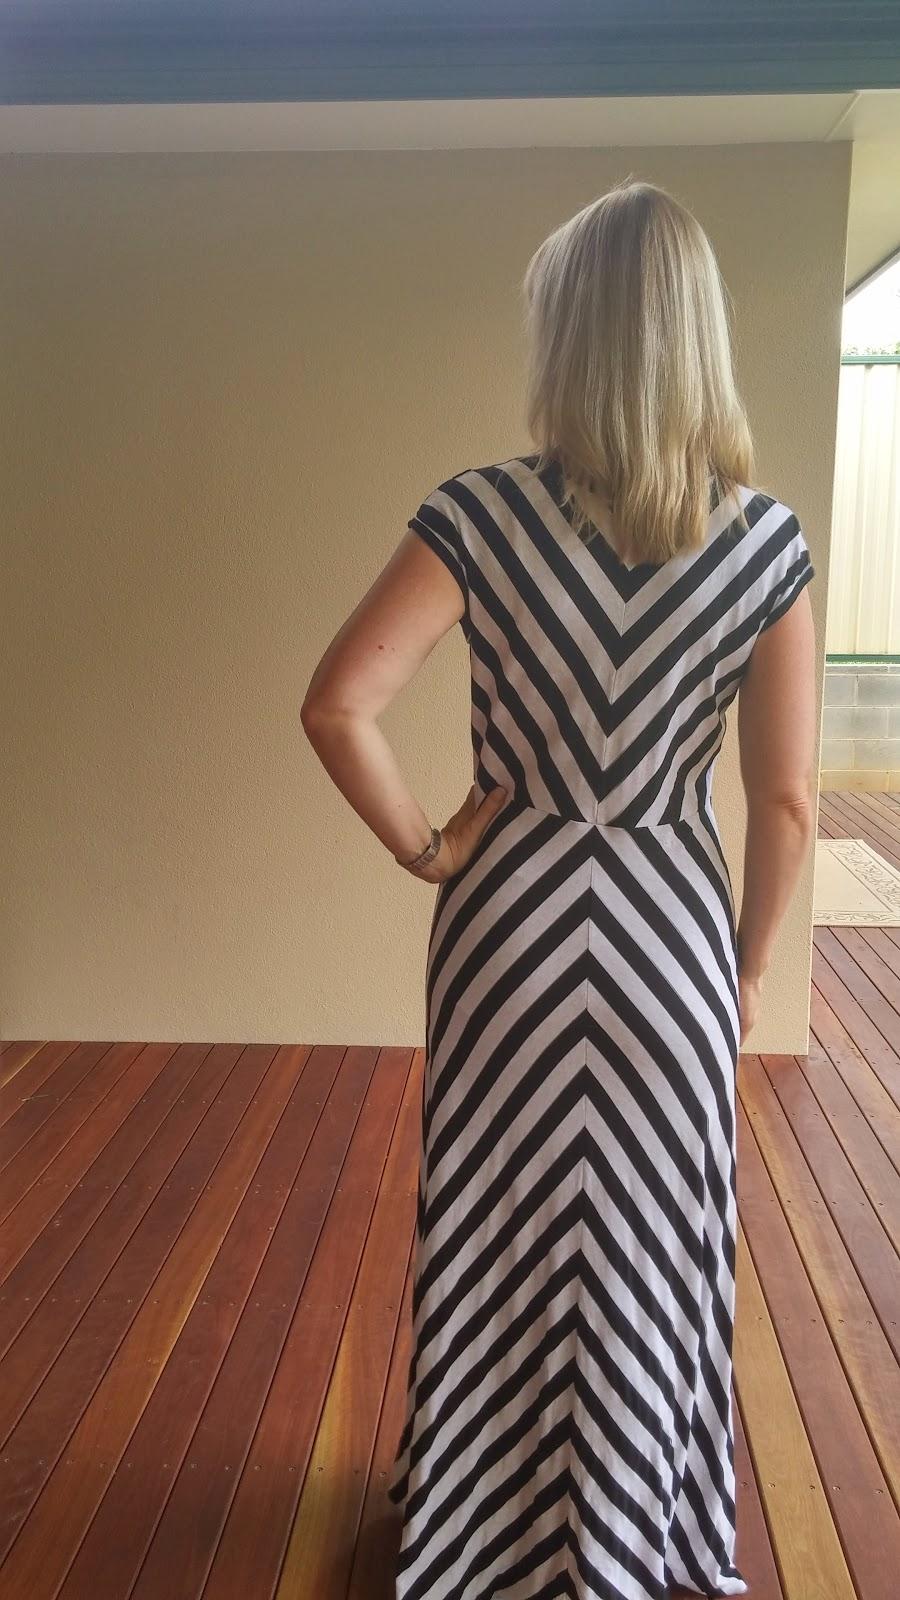 Vogue 1027 quarter circle maxi skirt back view showing chevrons